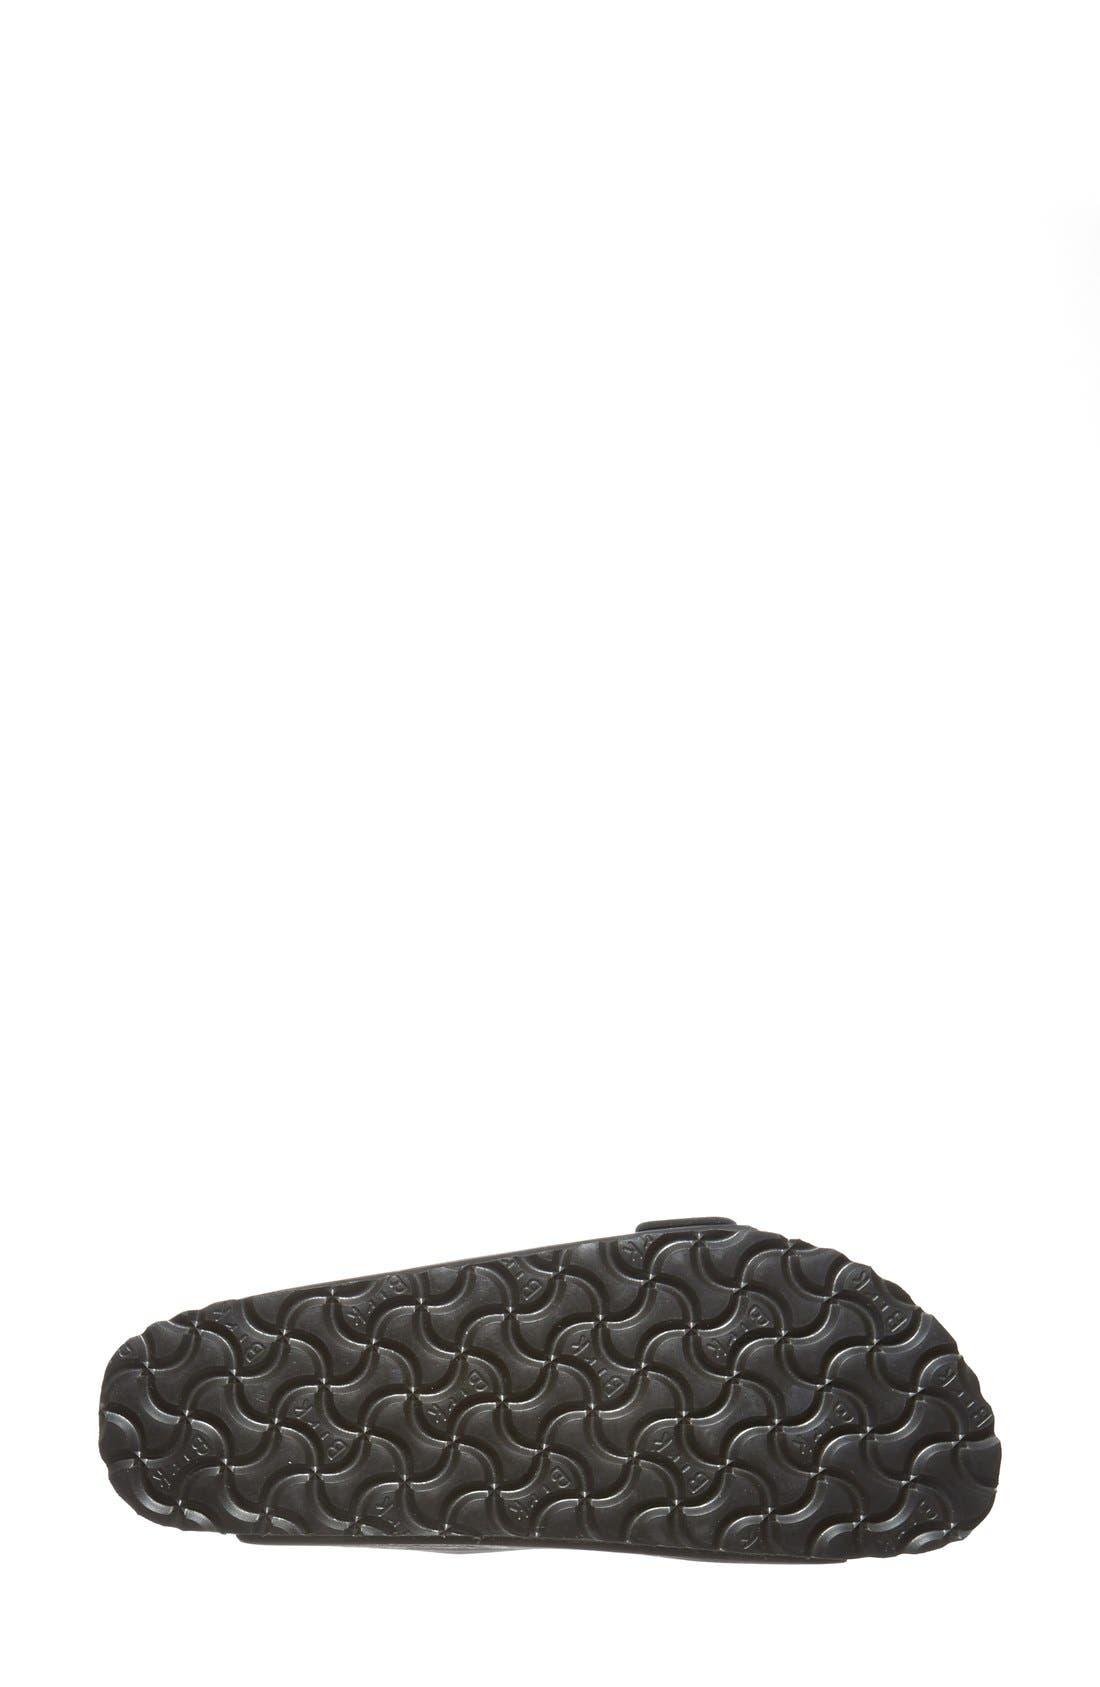 'Arizona' Soft Footbed Sandal,                             Alternate thumbnail 6, color,                             BLACK/ BLACK